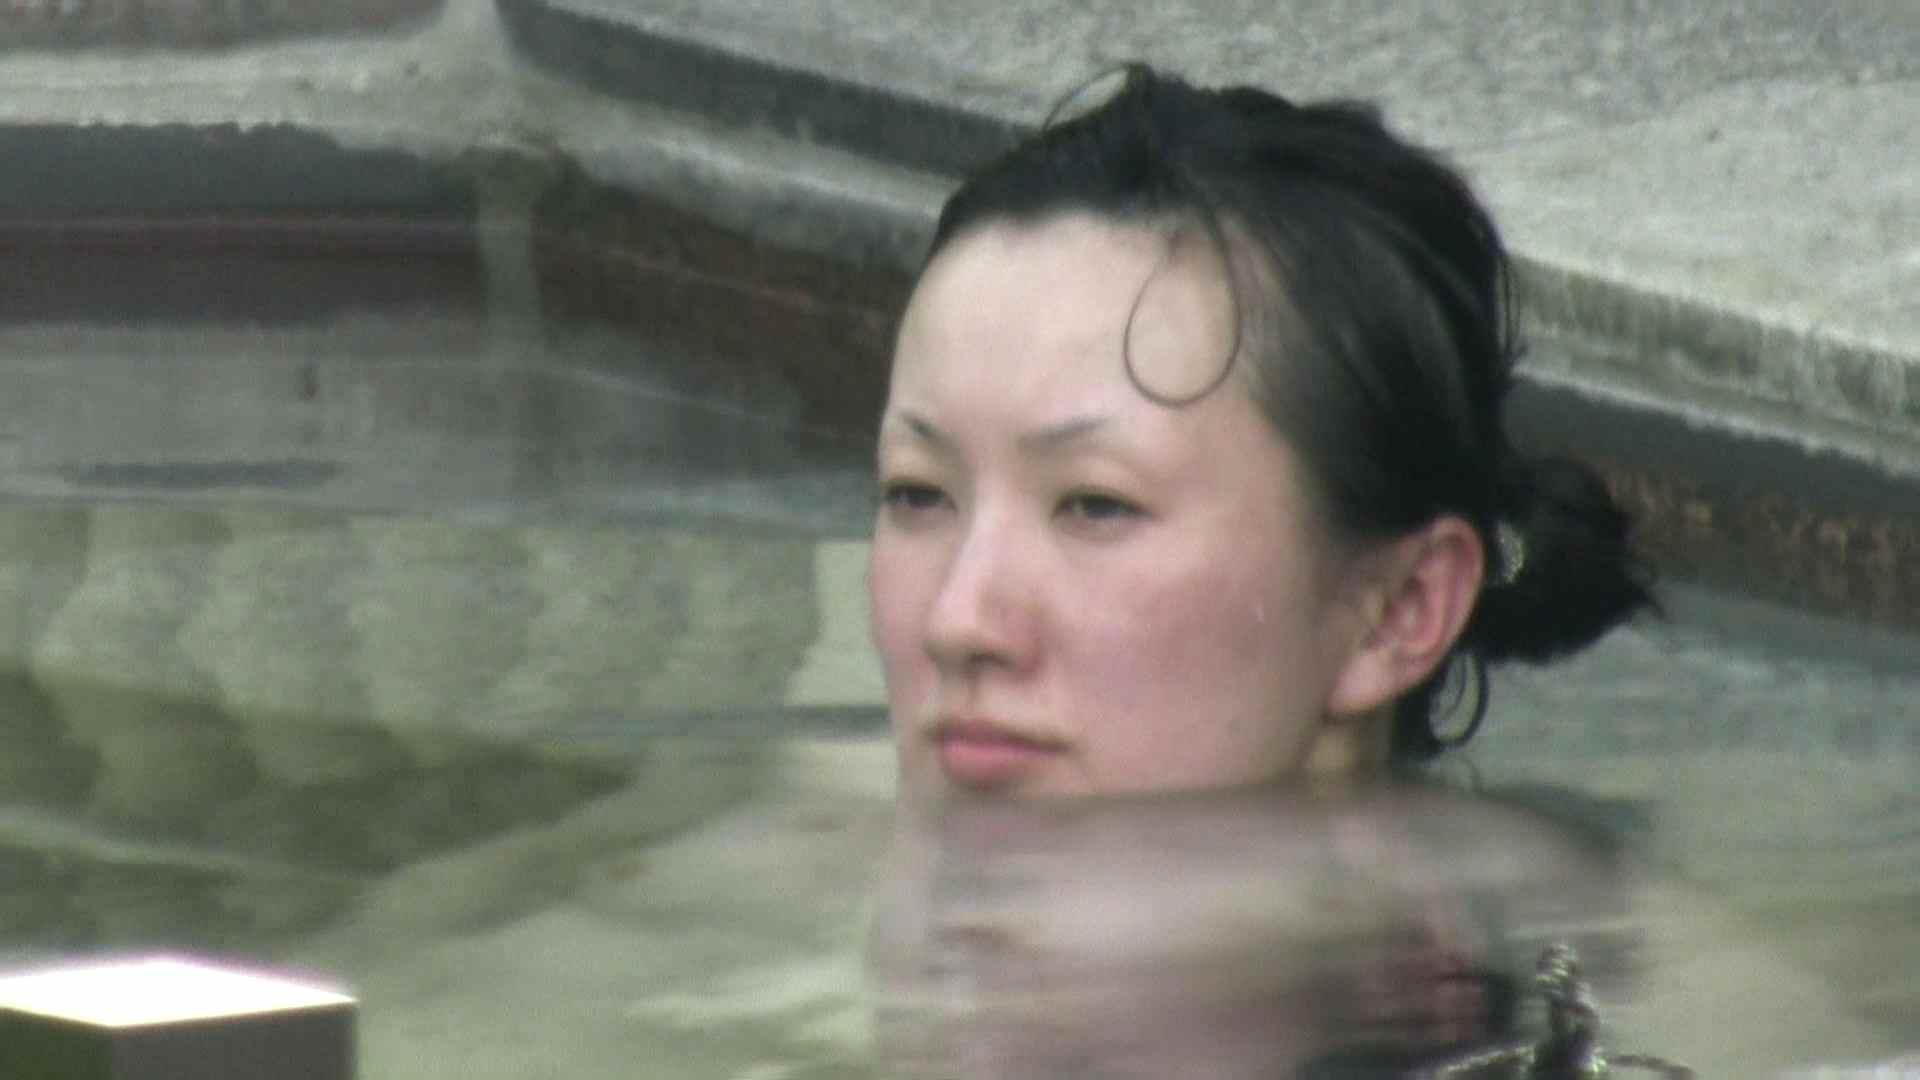 Aquaな露天風呂Vol.663 露天風呂編  77PIX 10